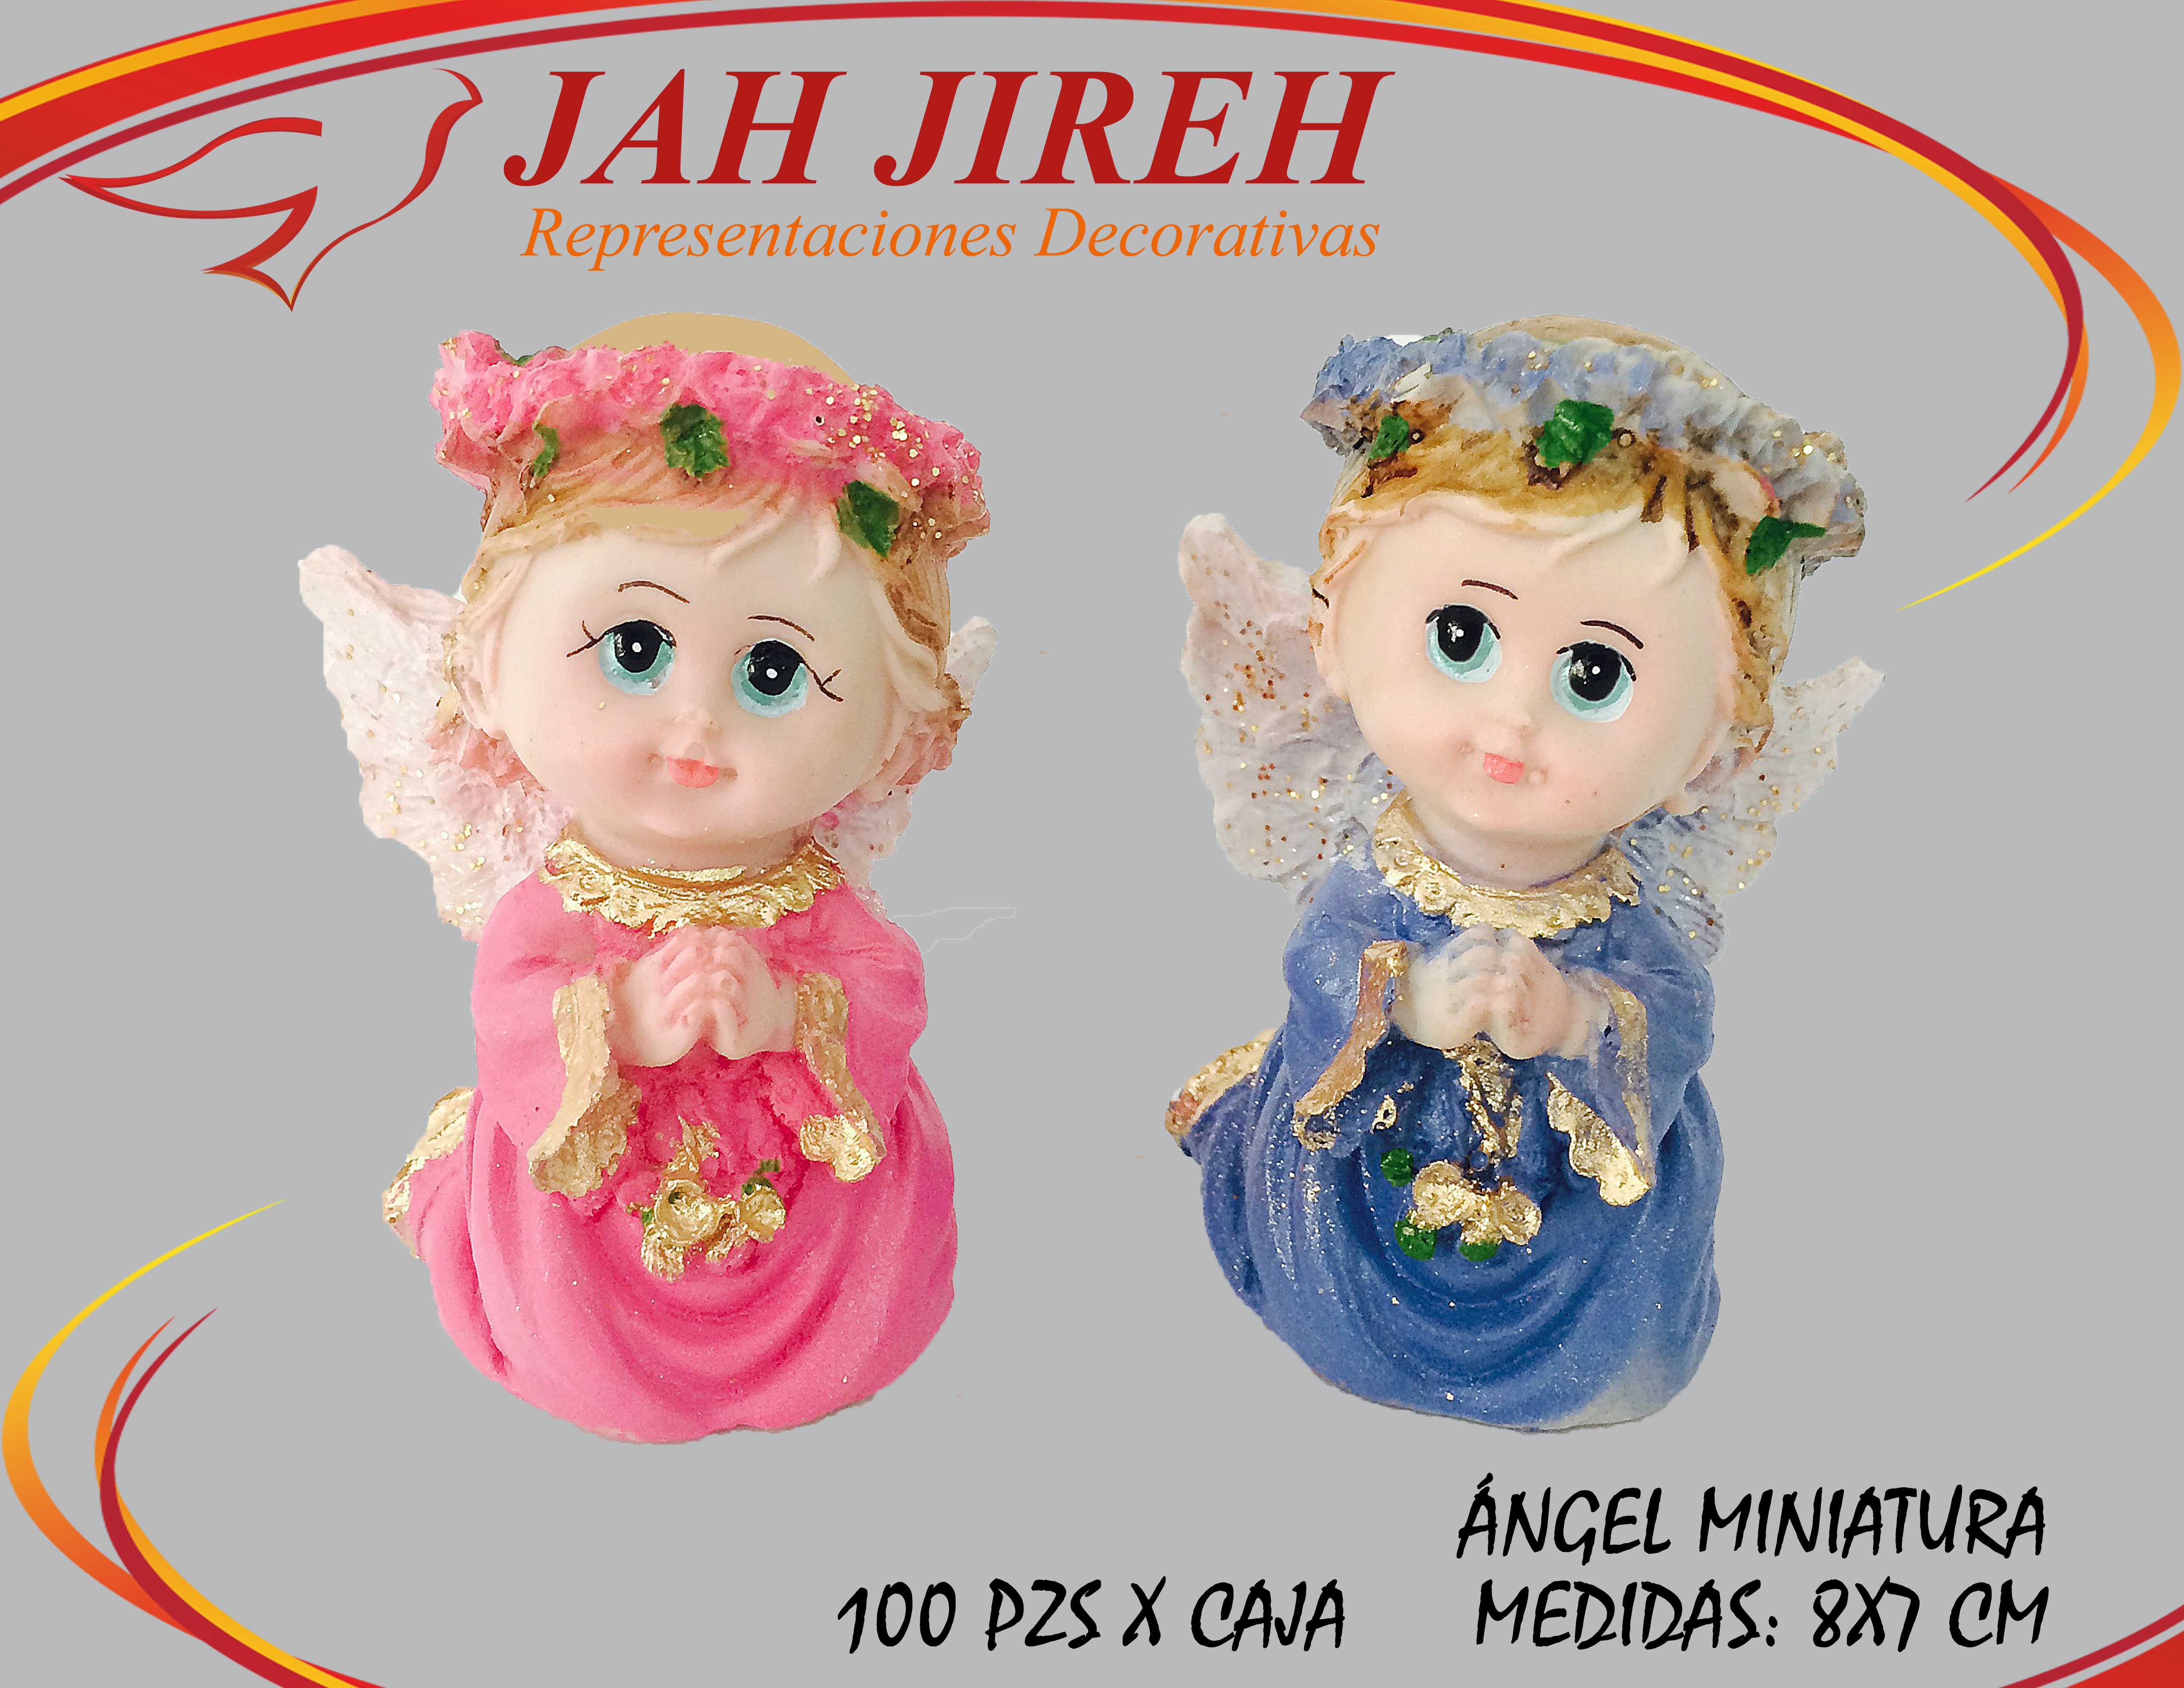 https://0201.nccdn.net/4_2/000/000/046/6ea/angel-miniatura.jpg